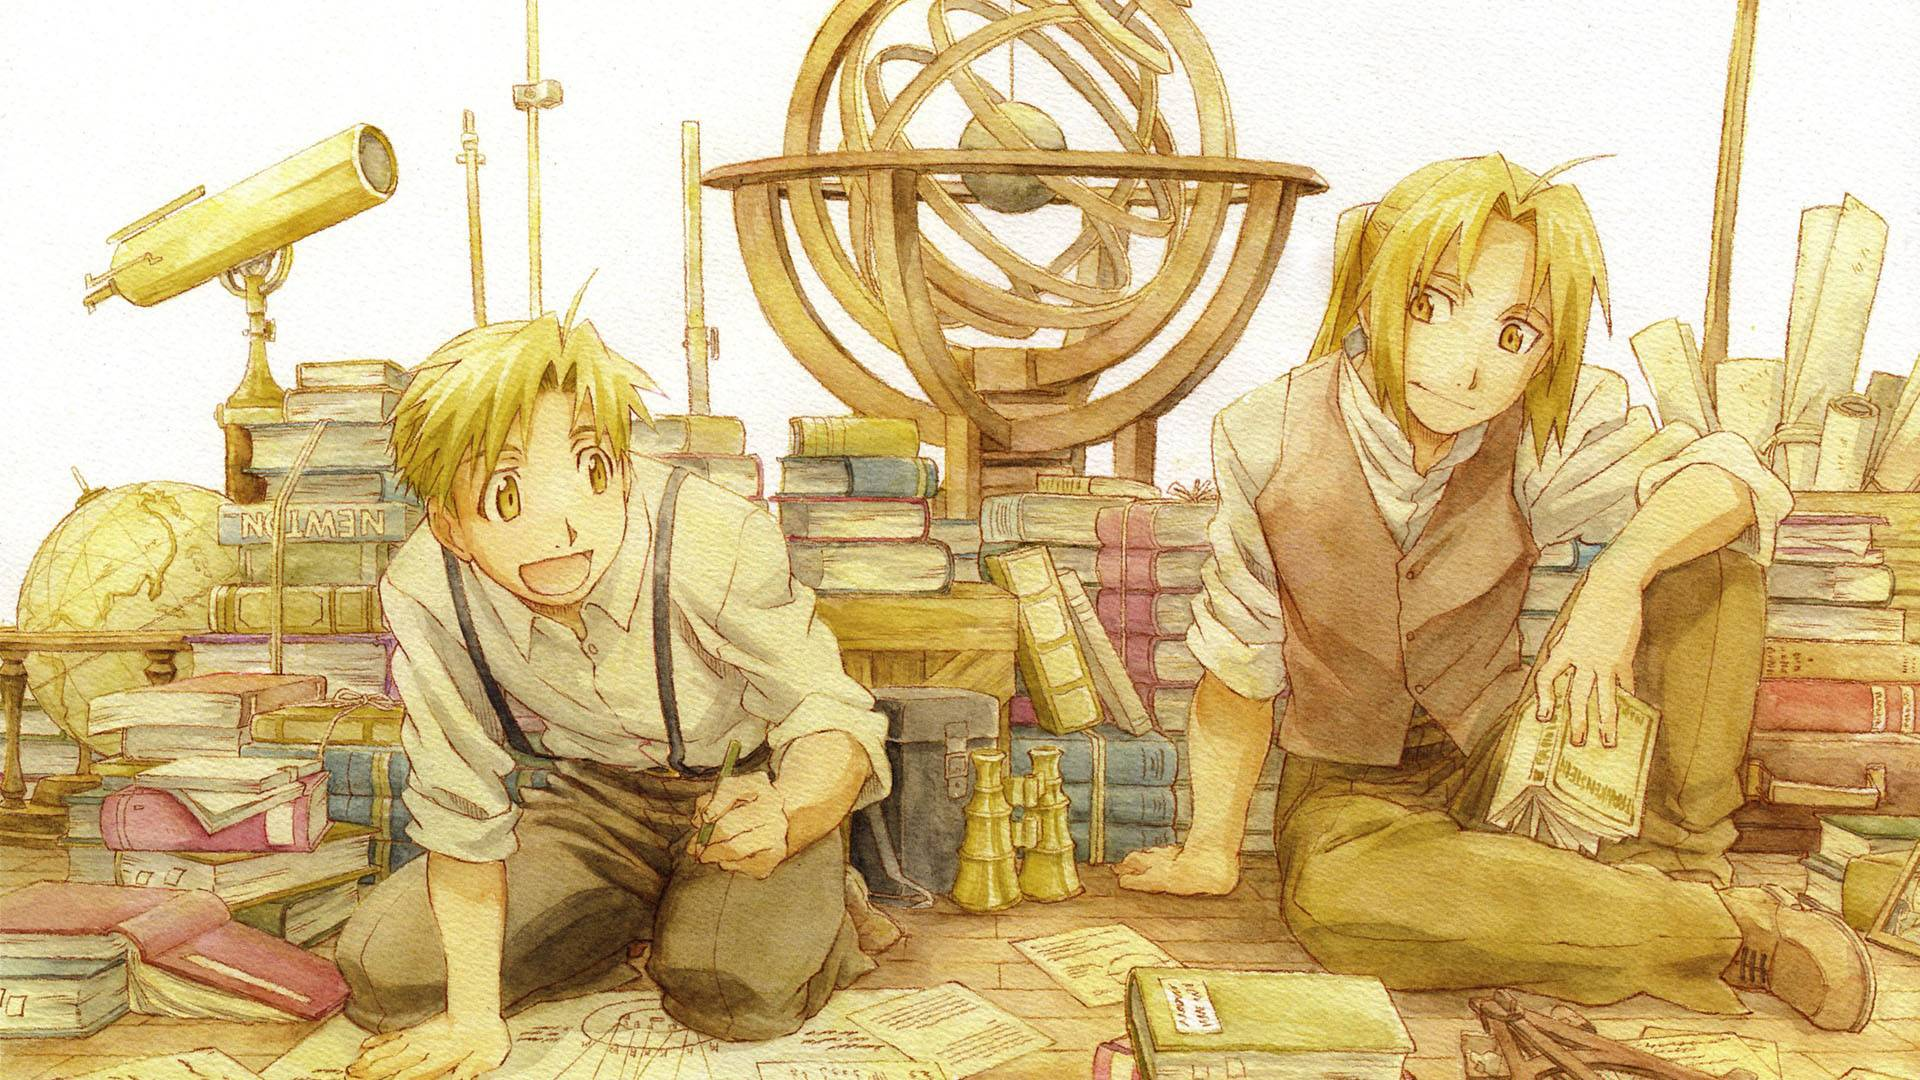 Full Metal Alchemist Edward And Alphonse Elric HD Wallpaper